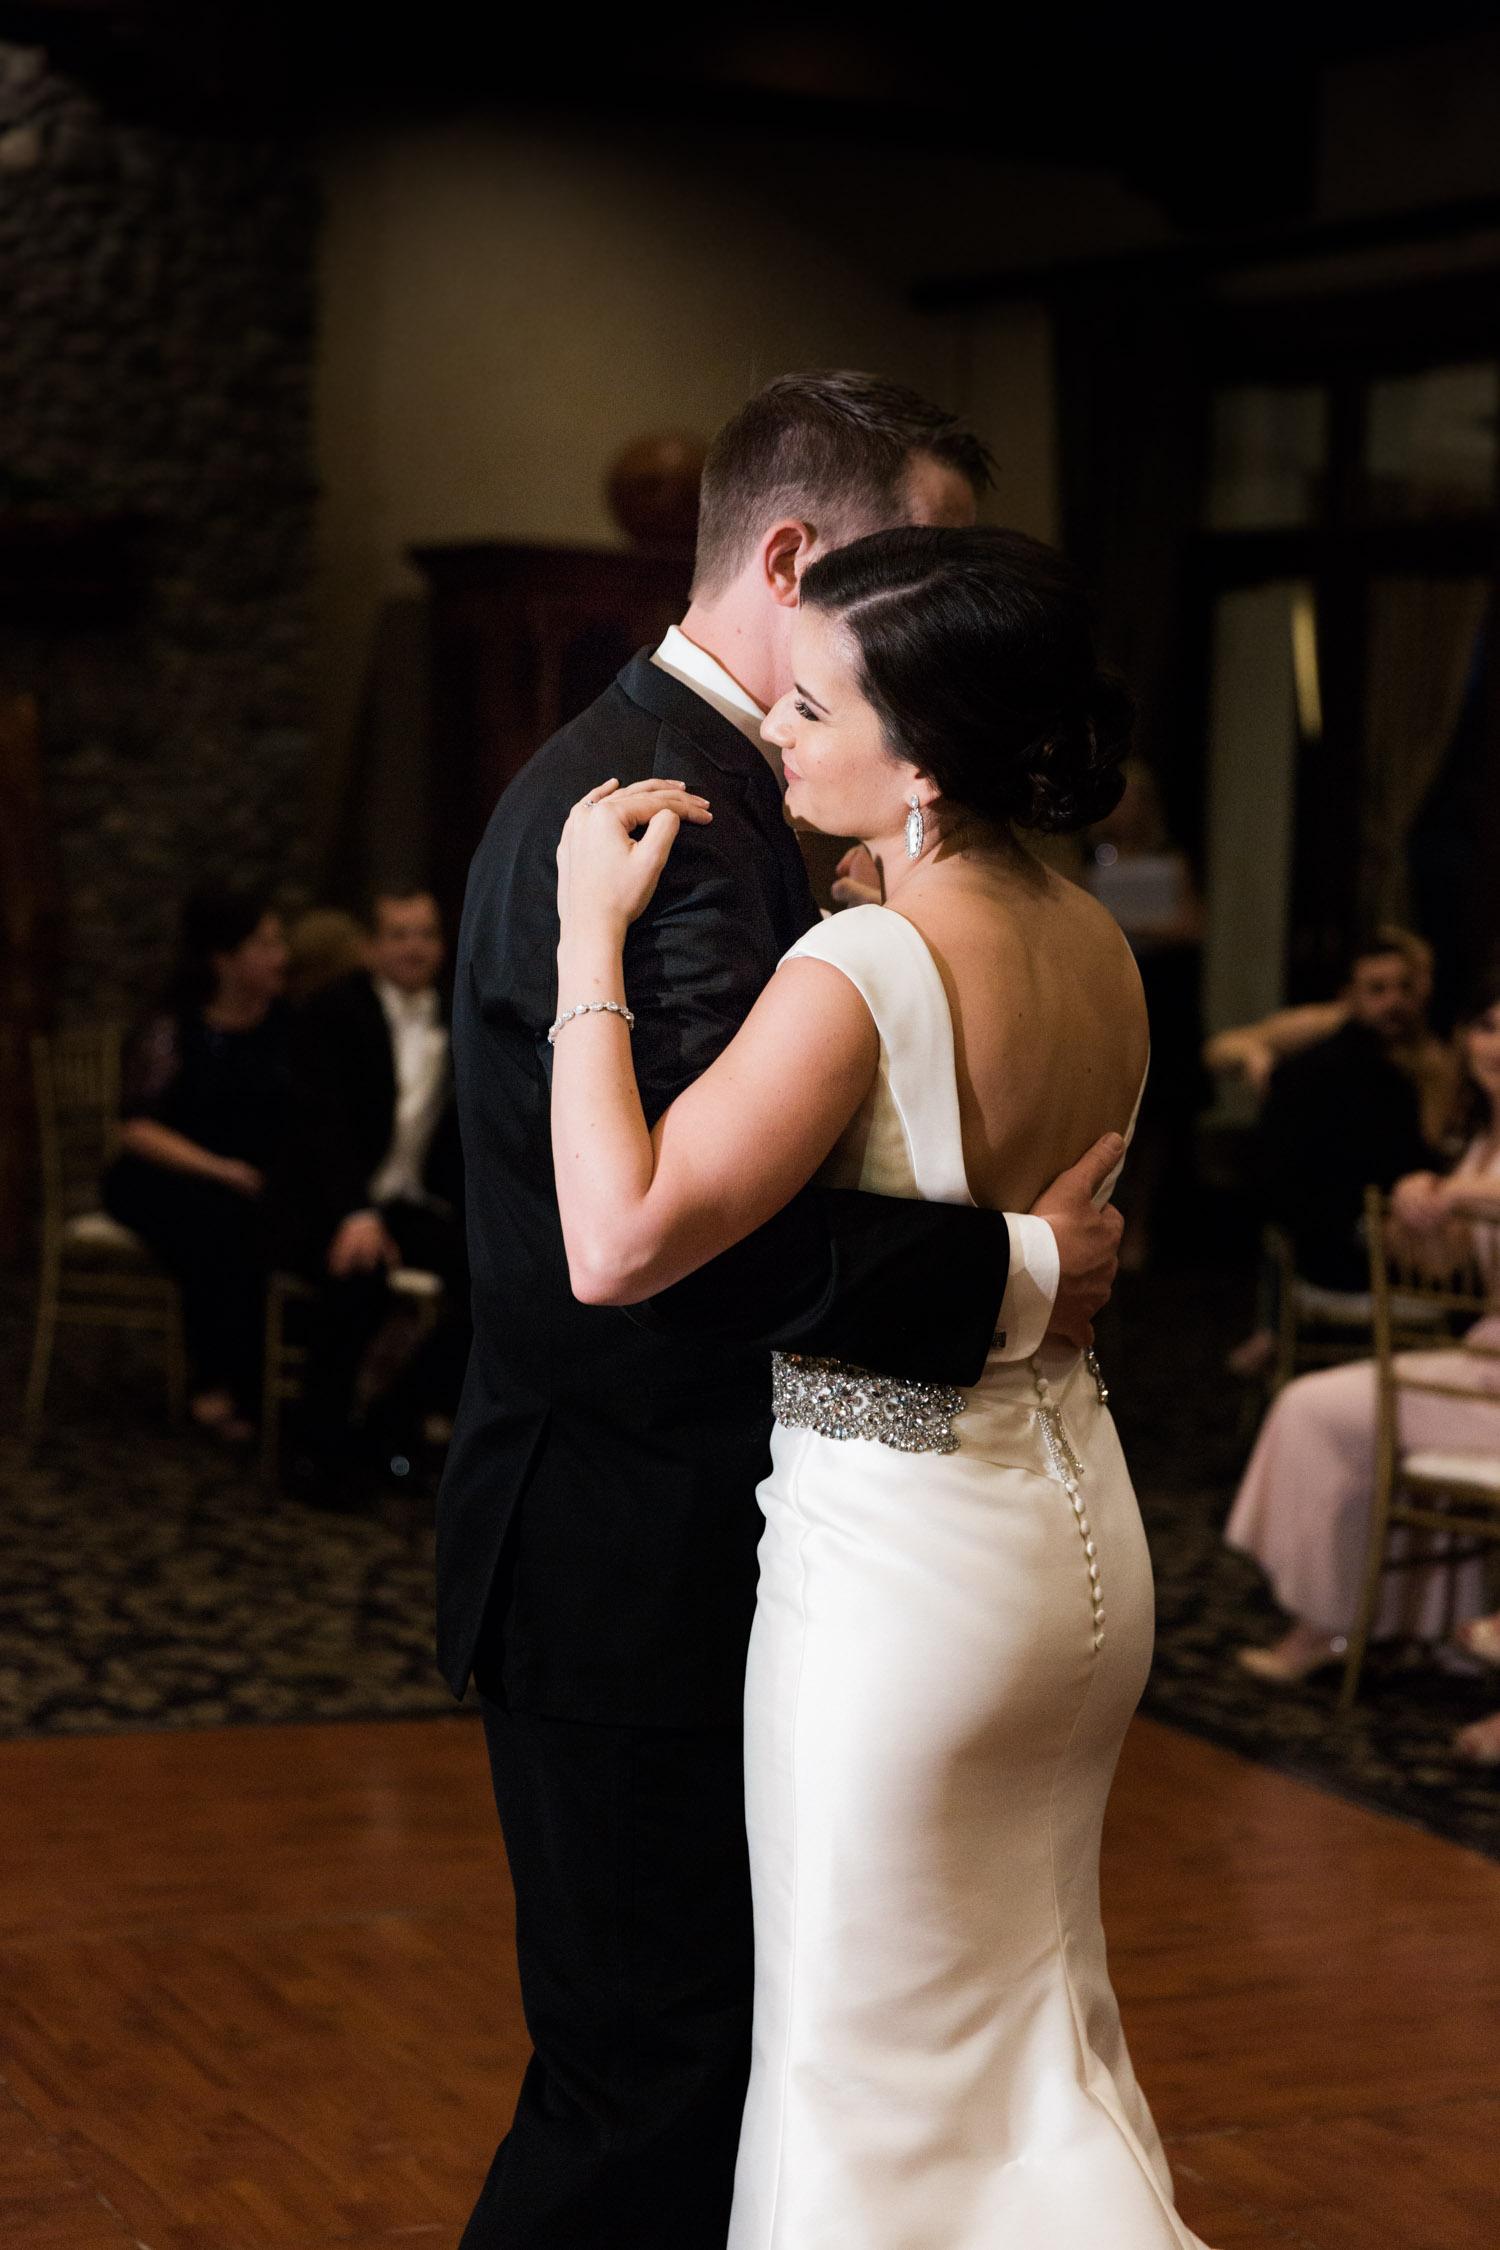 First wedding dane